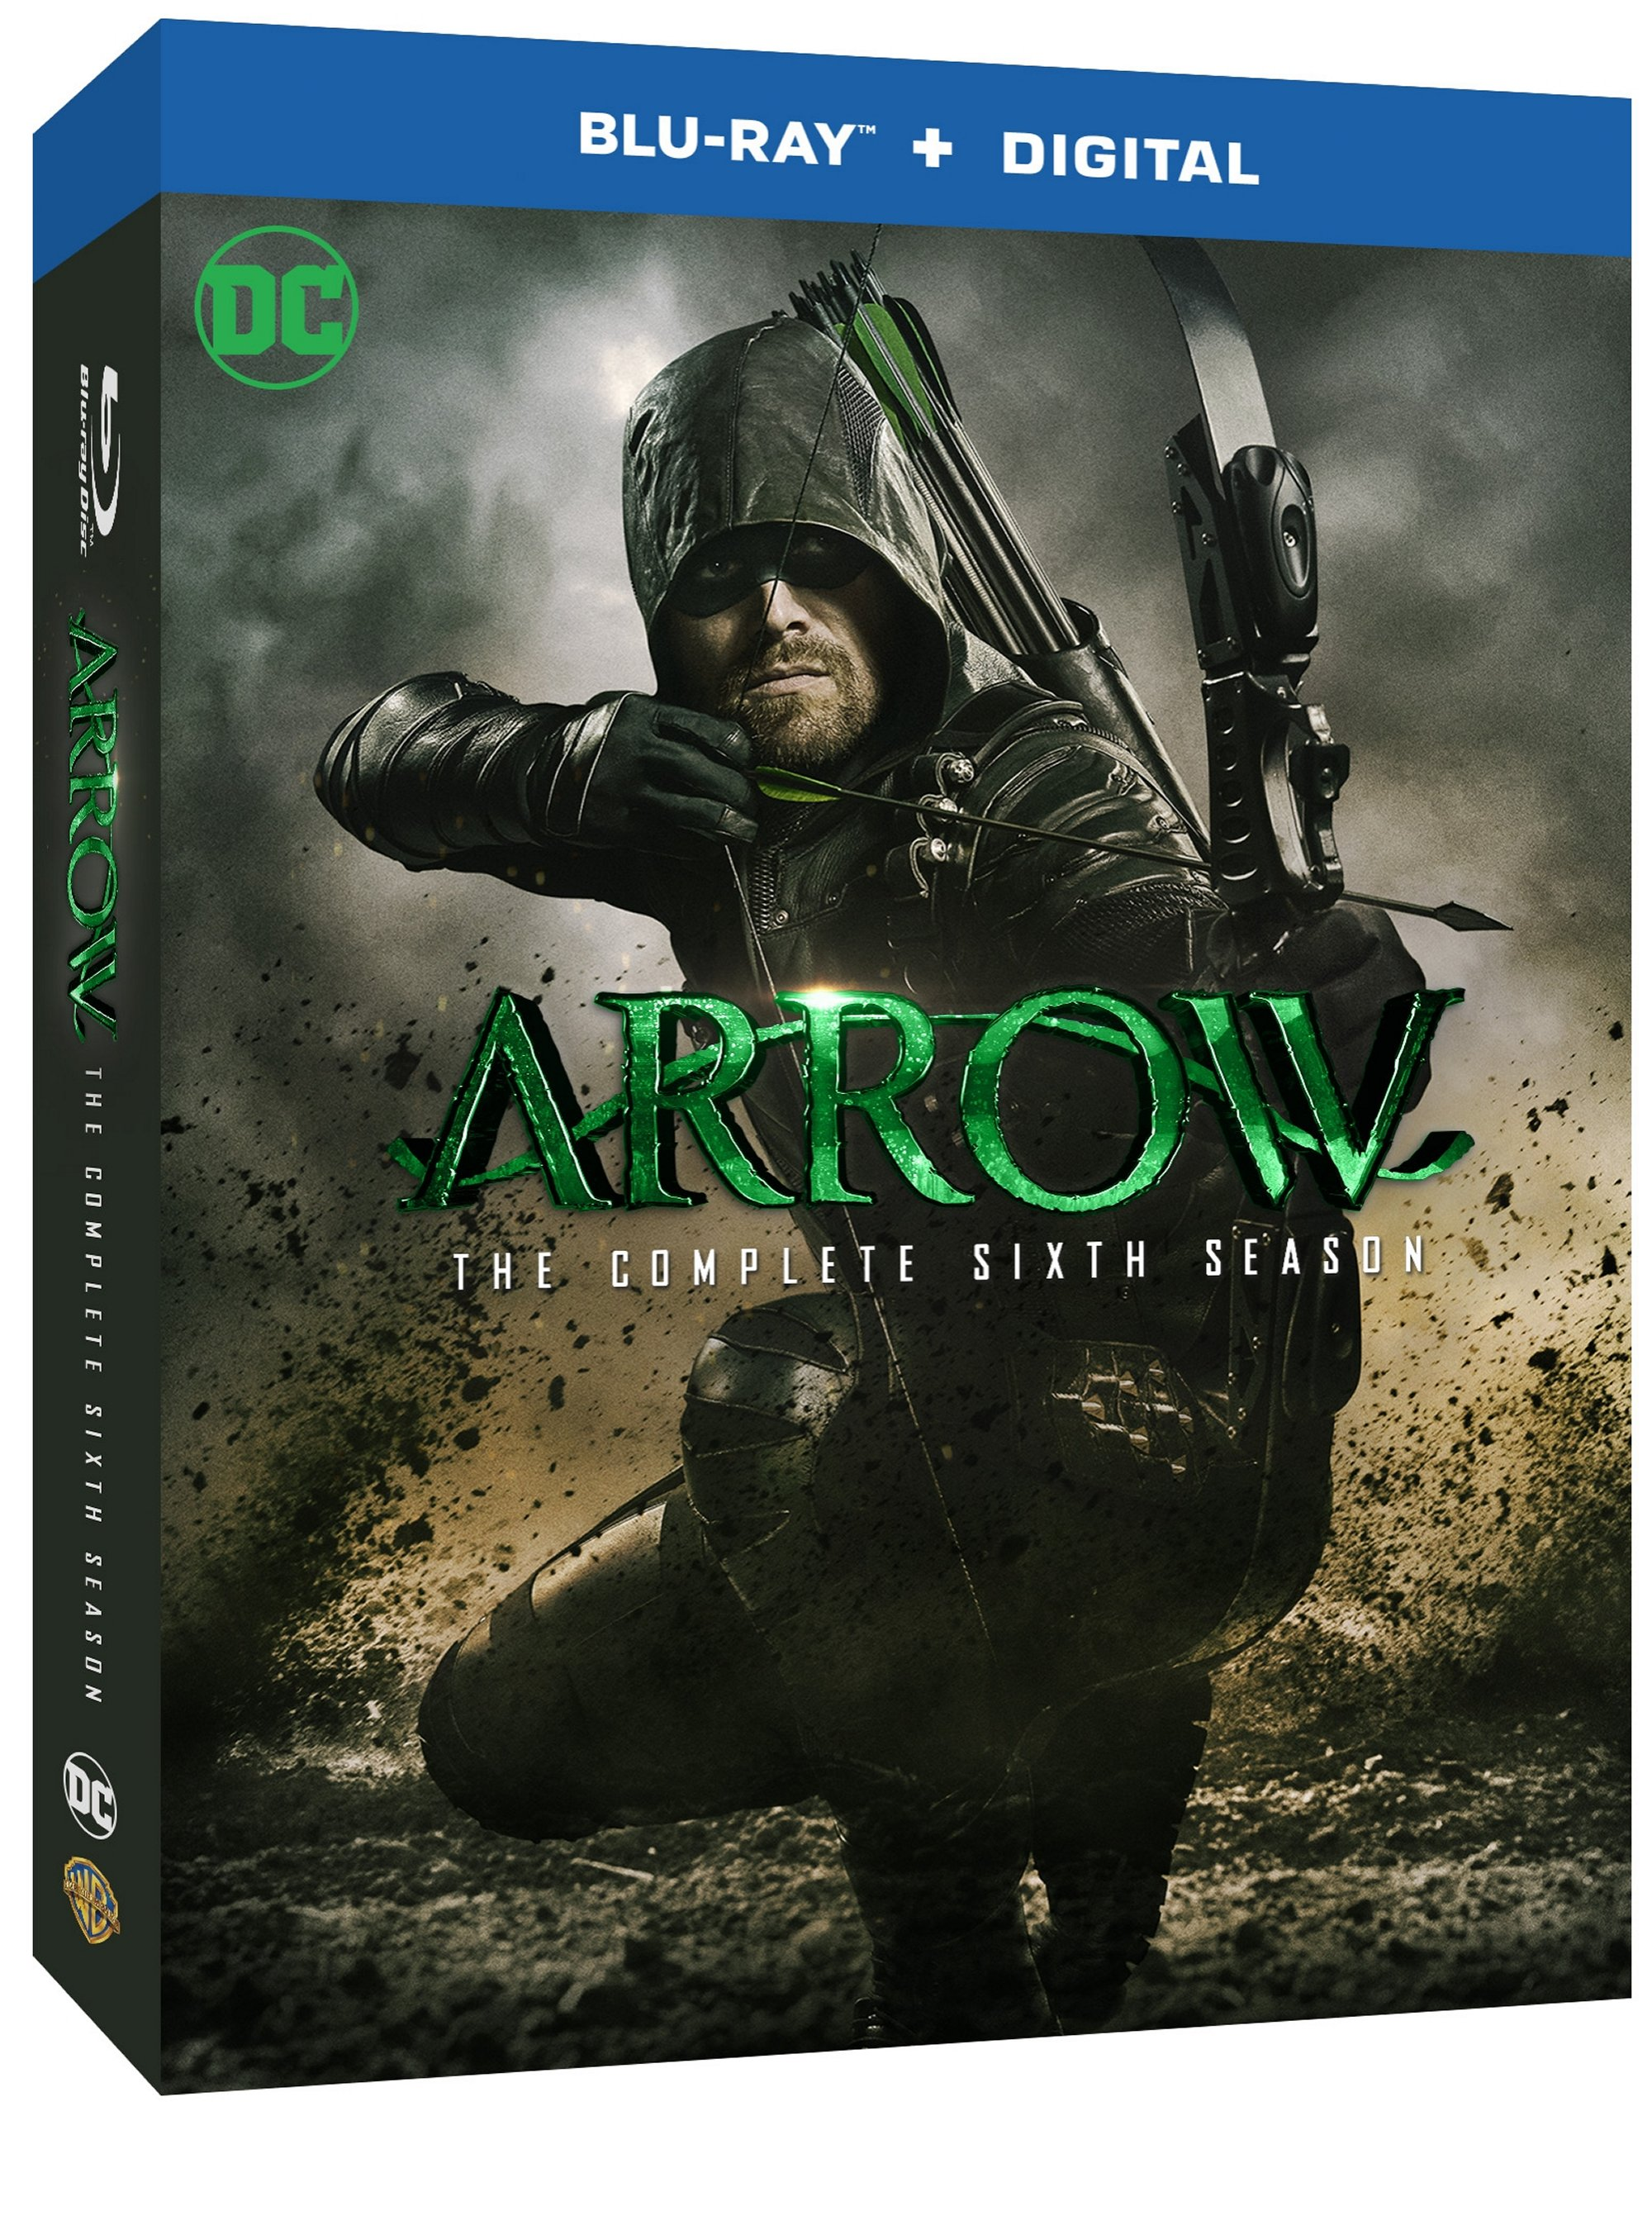 Arrow season six complete blu-ray dvd warner bros release